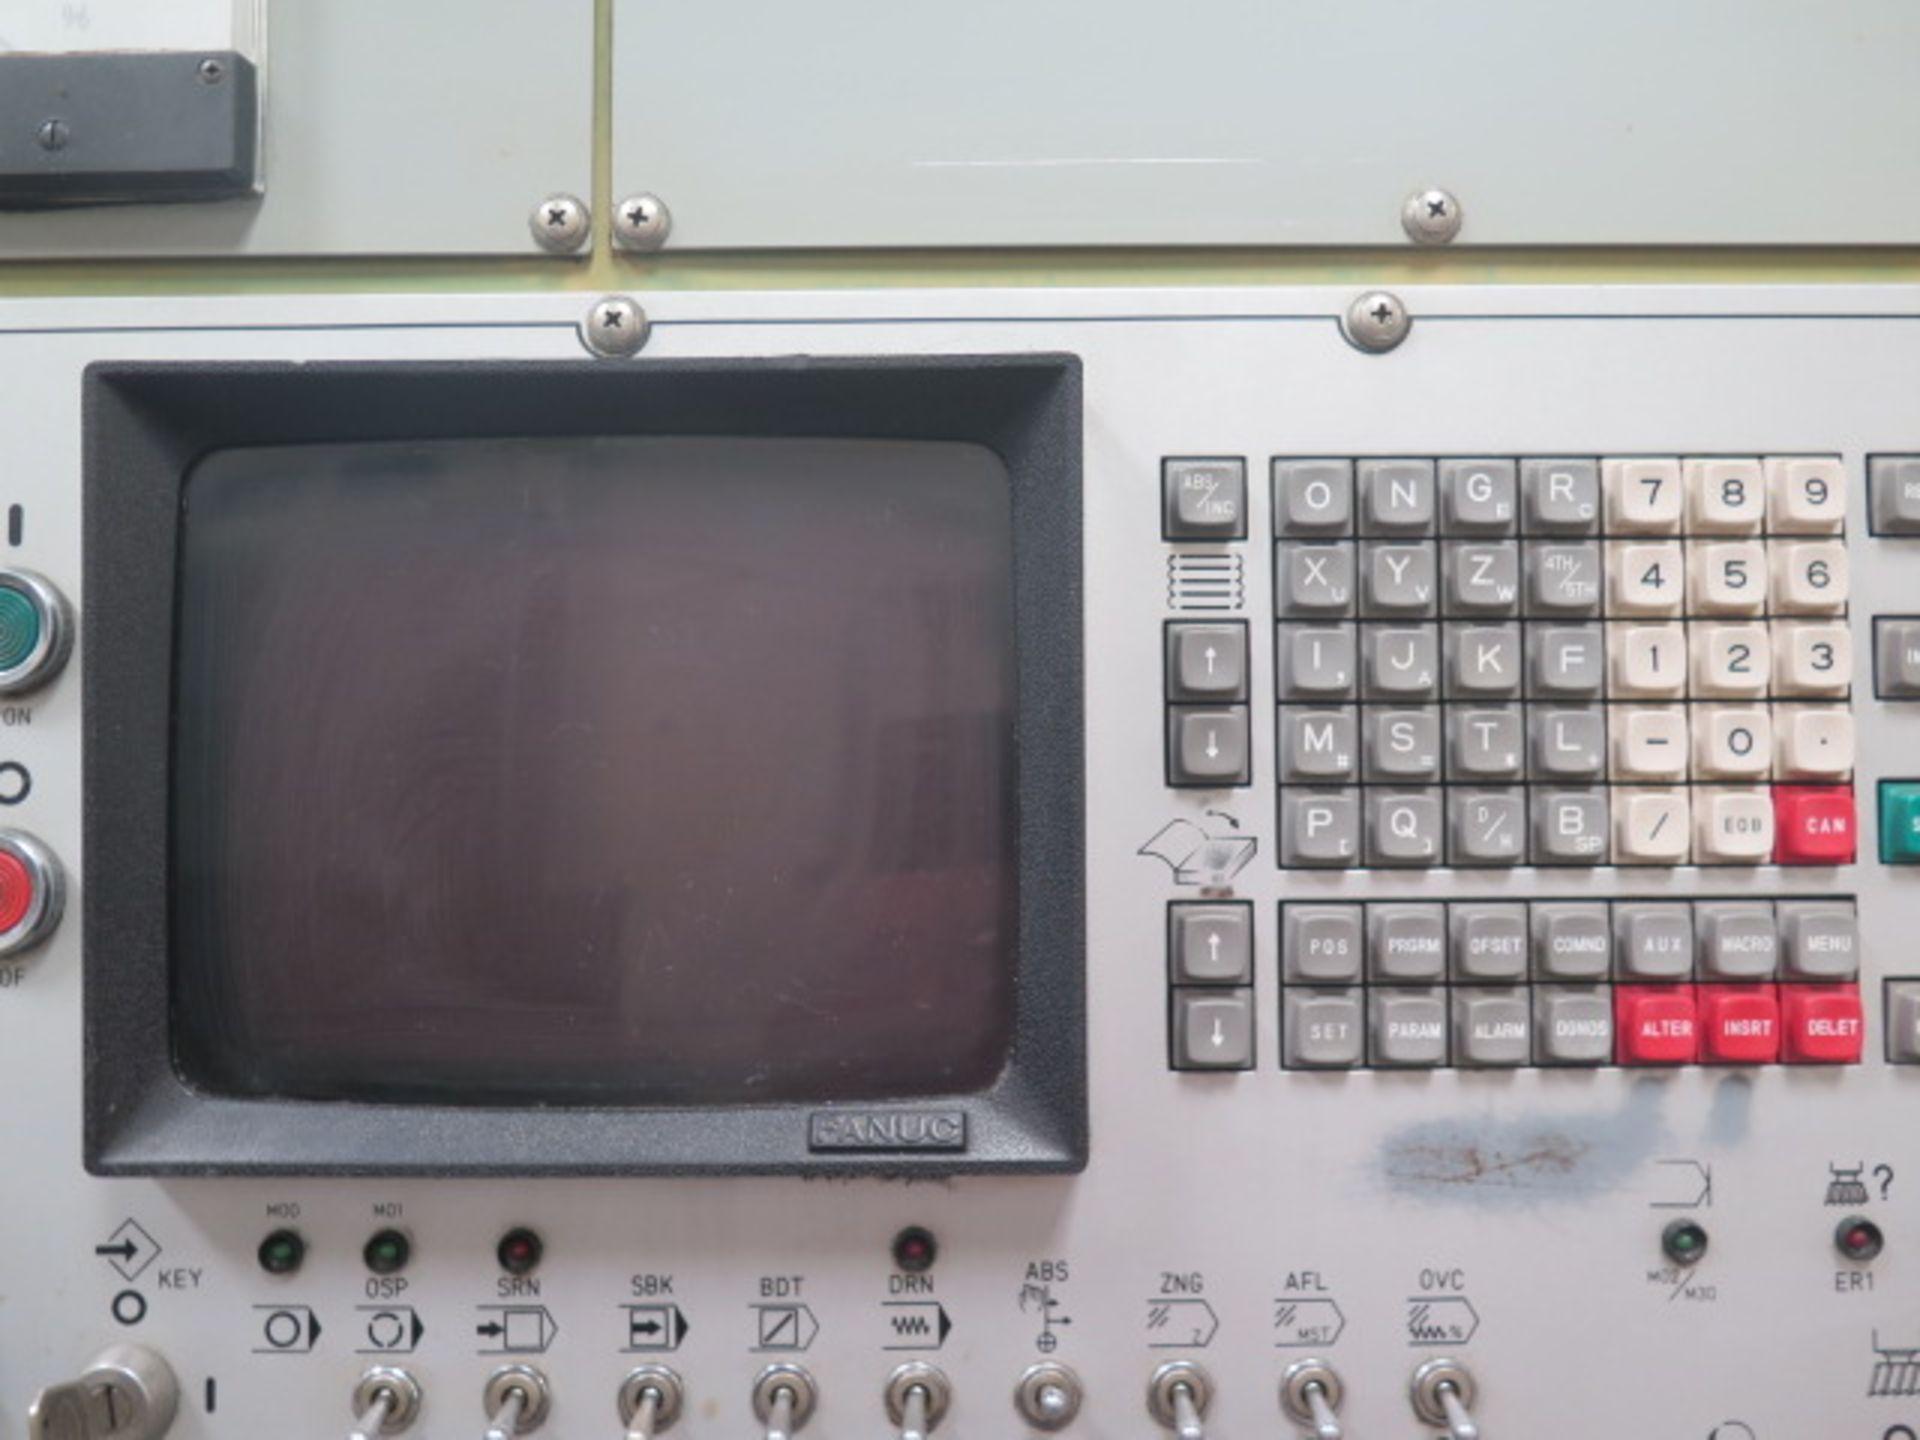 Mori Seiki MV-35/35 CNC VMC s/n 148 w/ Fanuc Controls, 20-Station ATC, BT-35, SOLD AS IS - Image 6 of 14